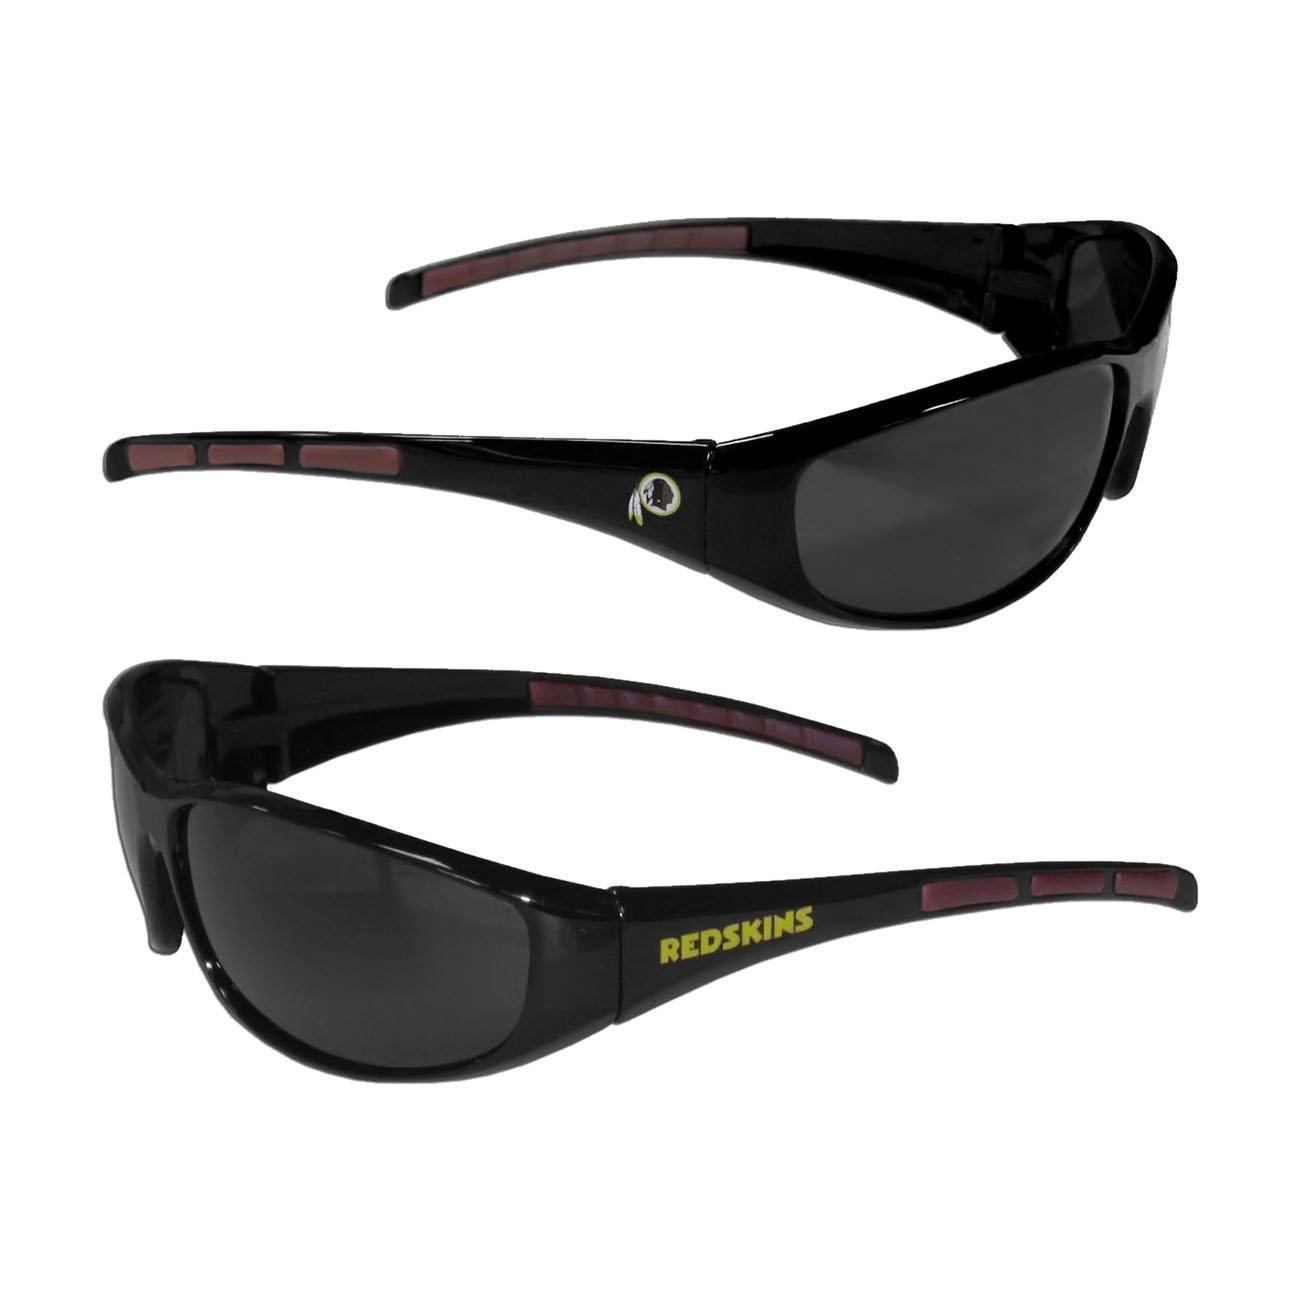 Eason Eyewear ユニセックスアダルト B01DOEQBQK シルバー/グリーン|鏡面仕上げレンズブルー シルバー/グリーン